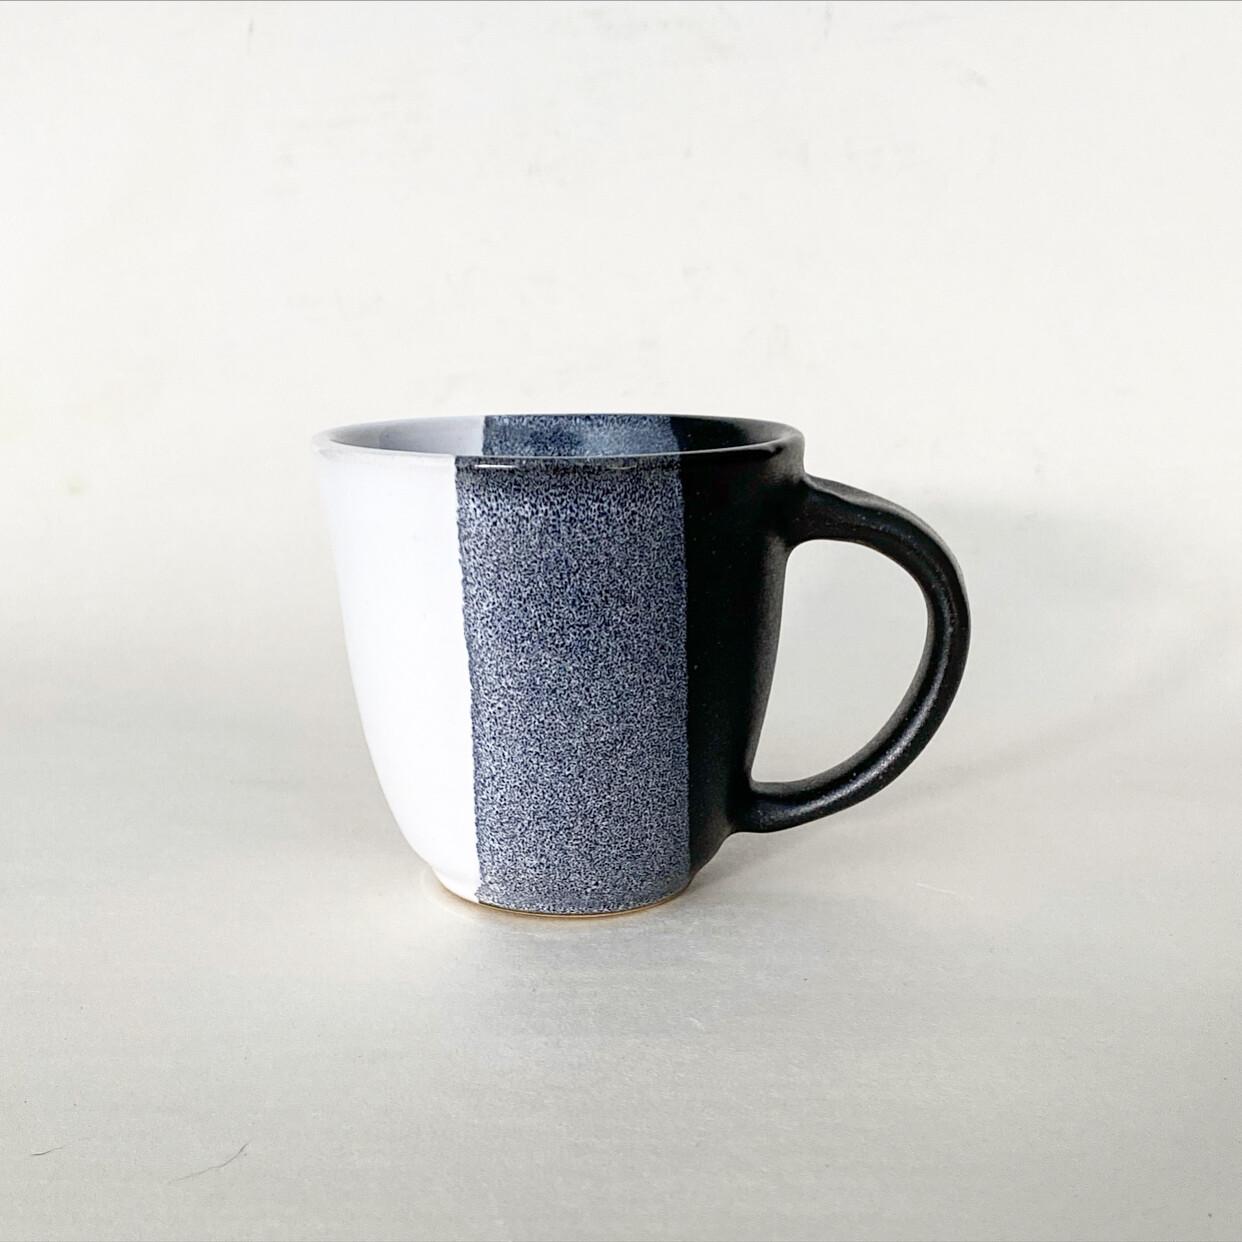 10oz Black and white Mug